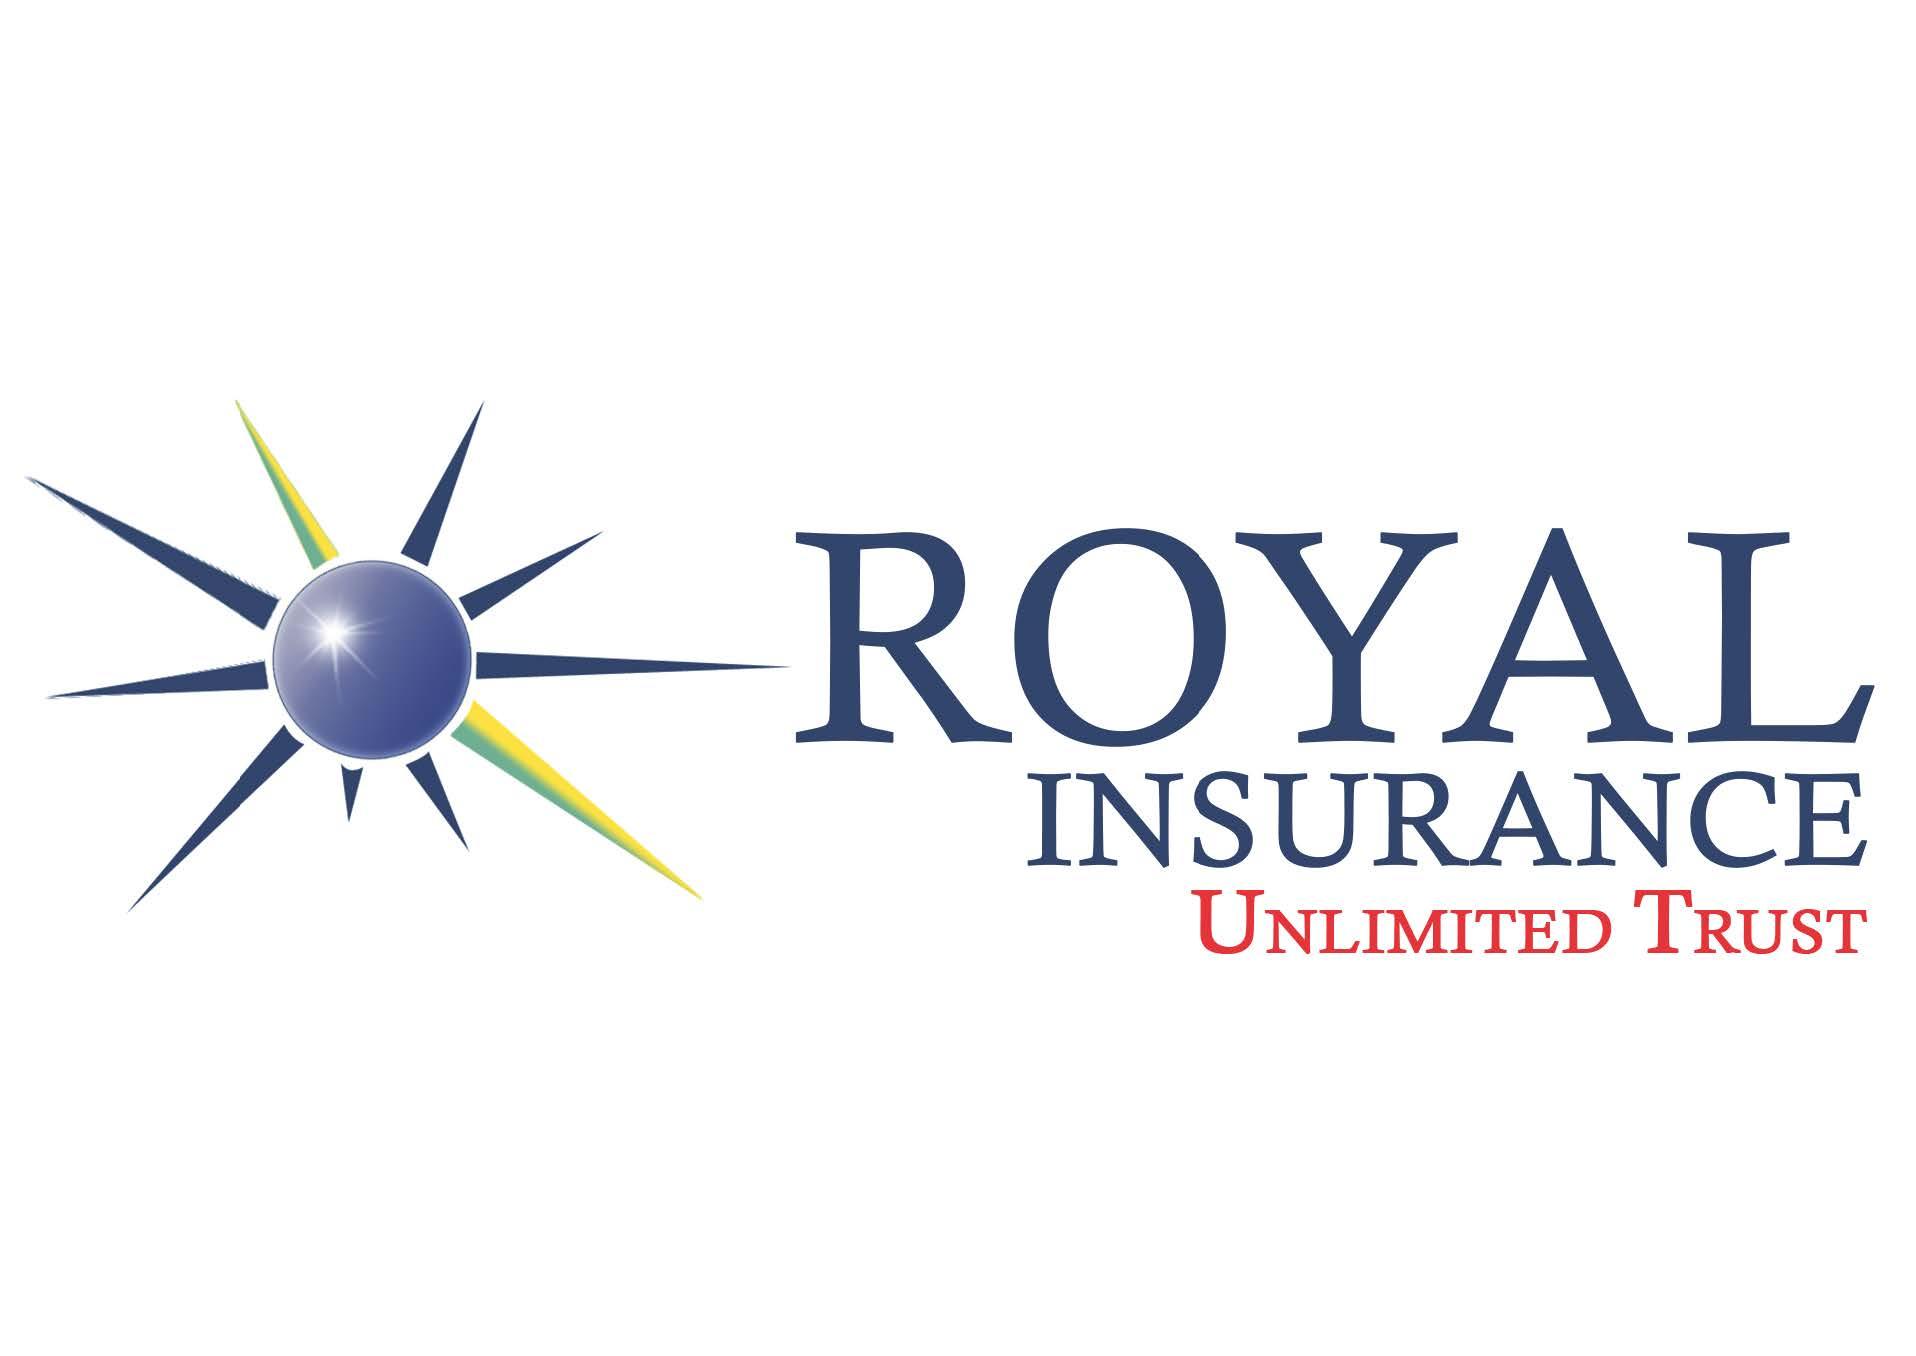 Royal insurance - logo